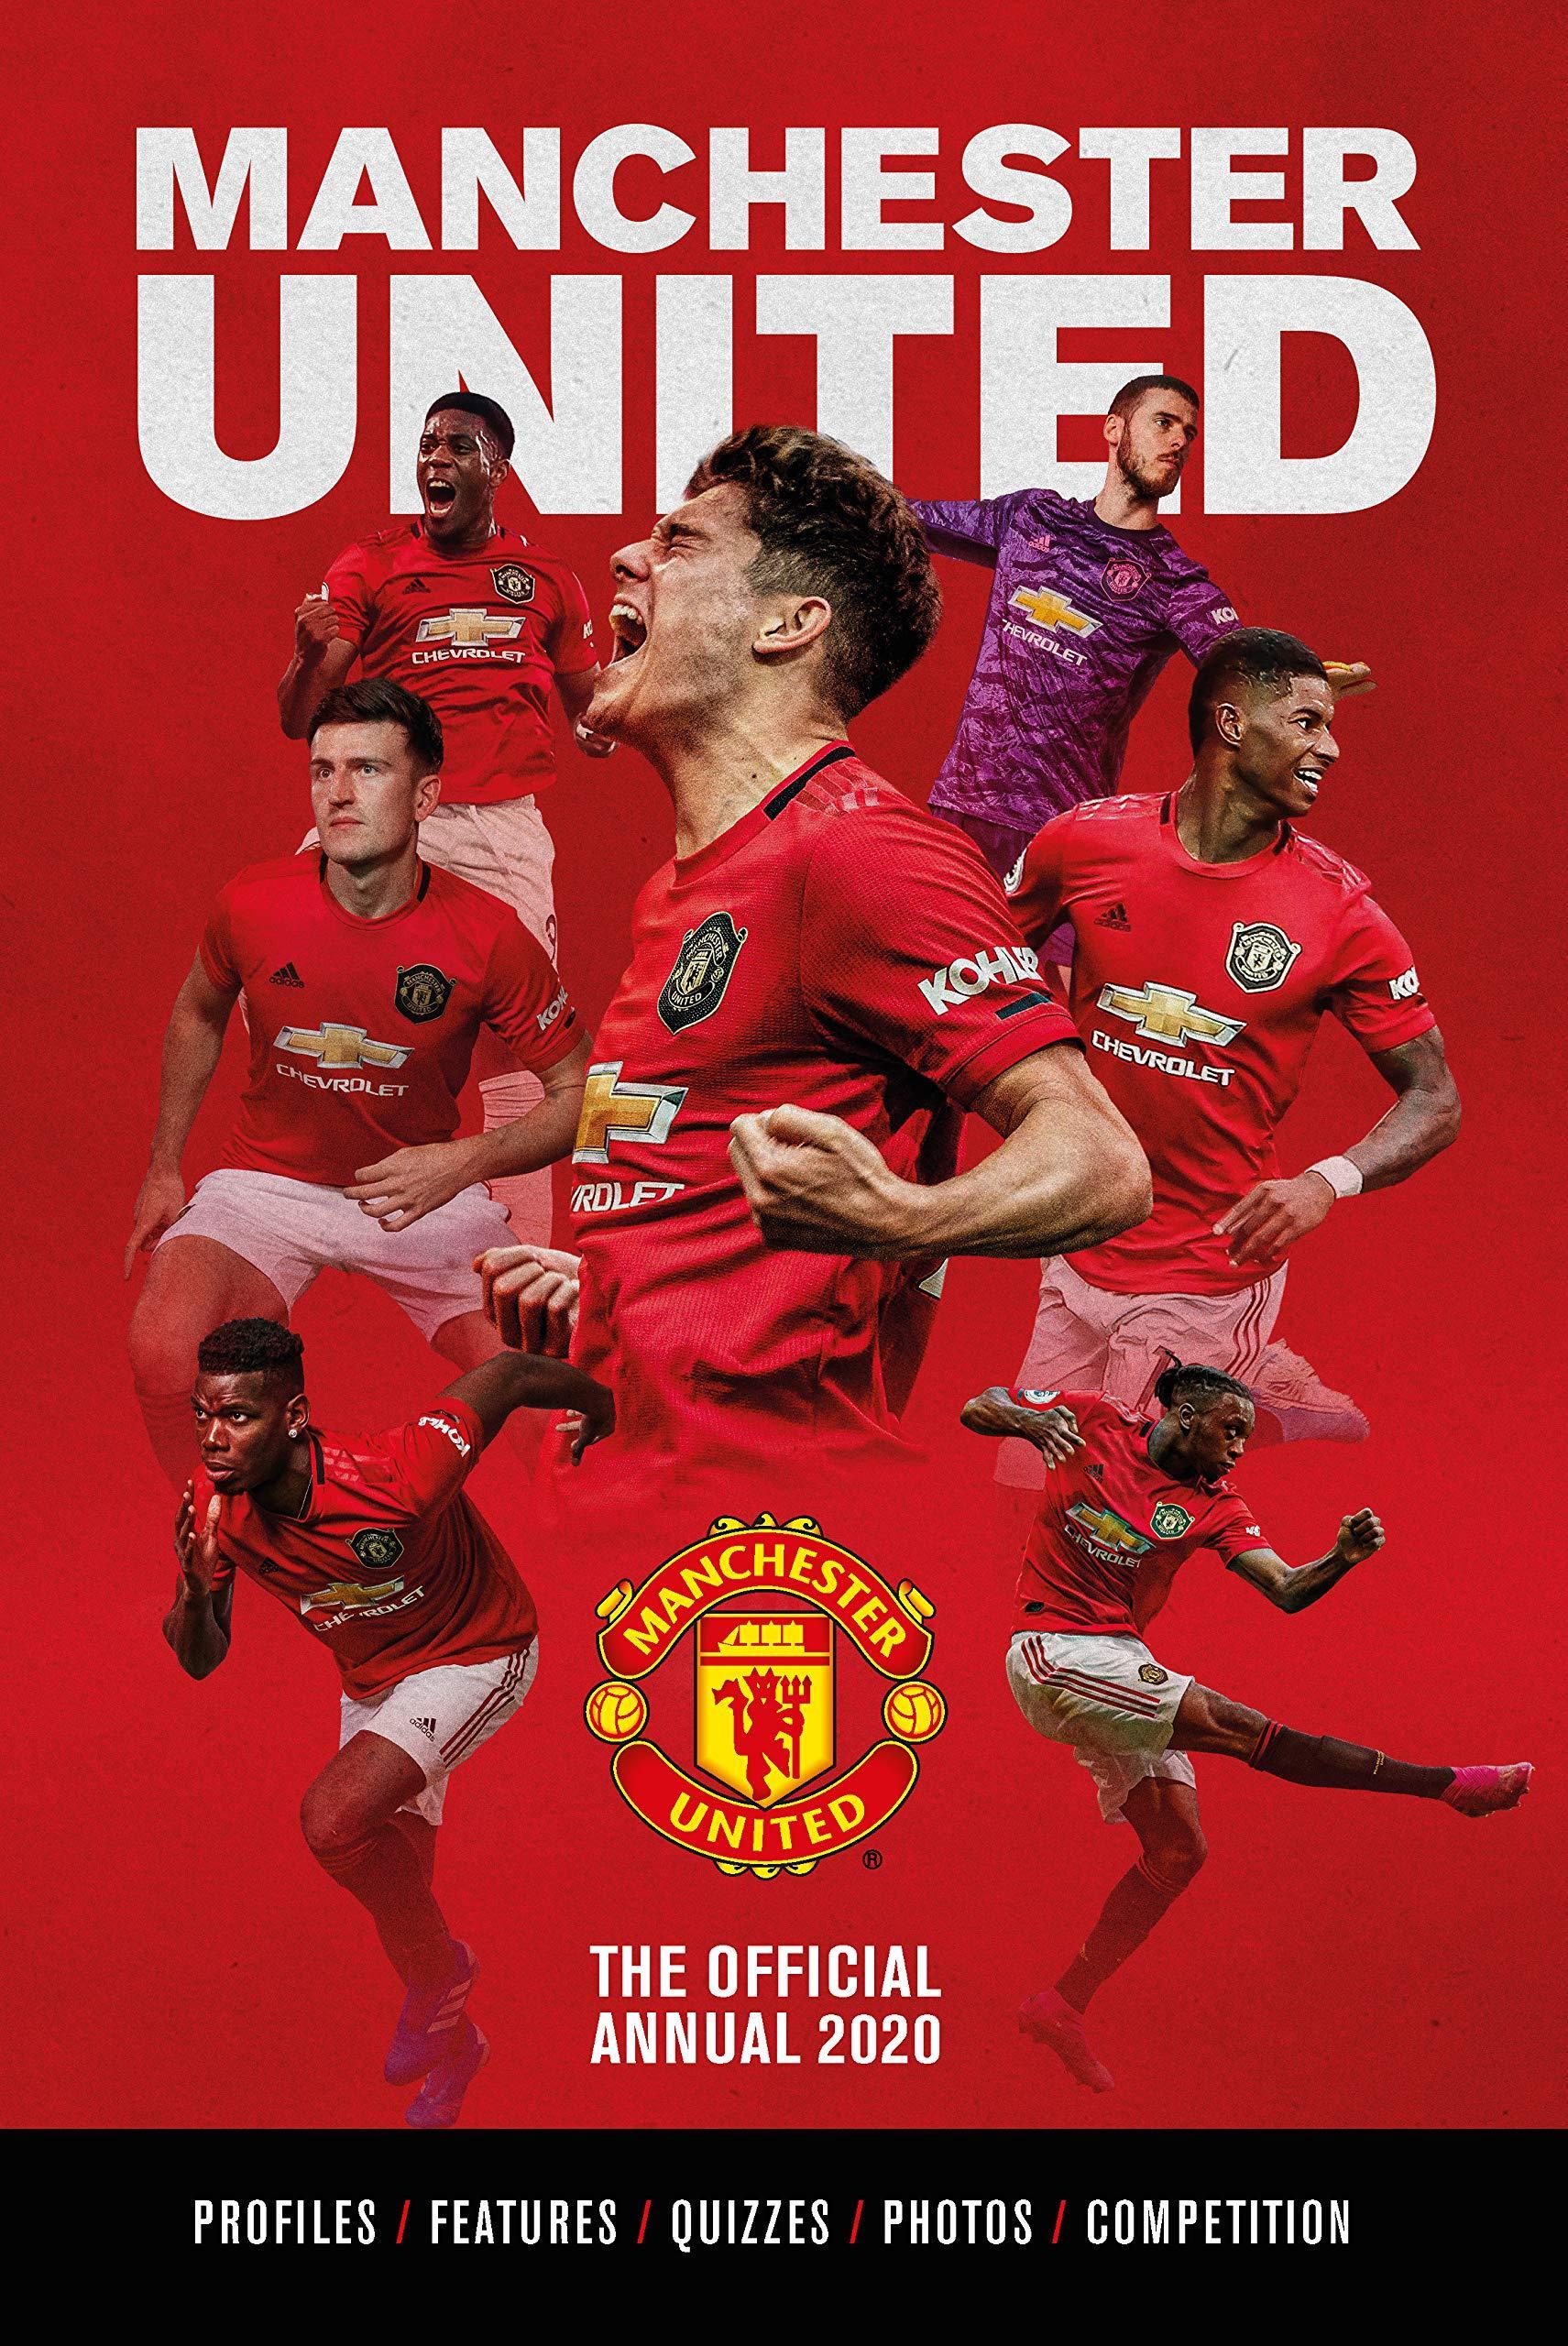 Utd 2022 Calendar.Manchester United 2020 Wallpapers Top Free Manchester United 2020 Backgrounds Wallpaperaccess